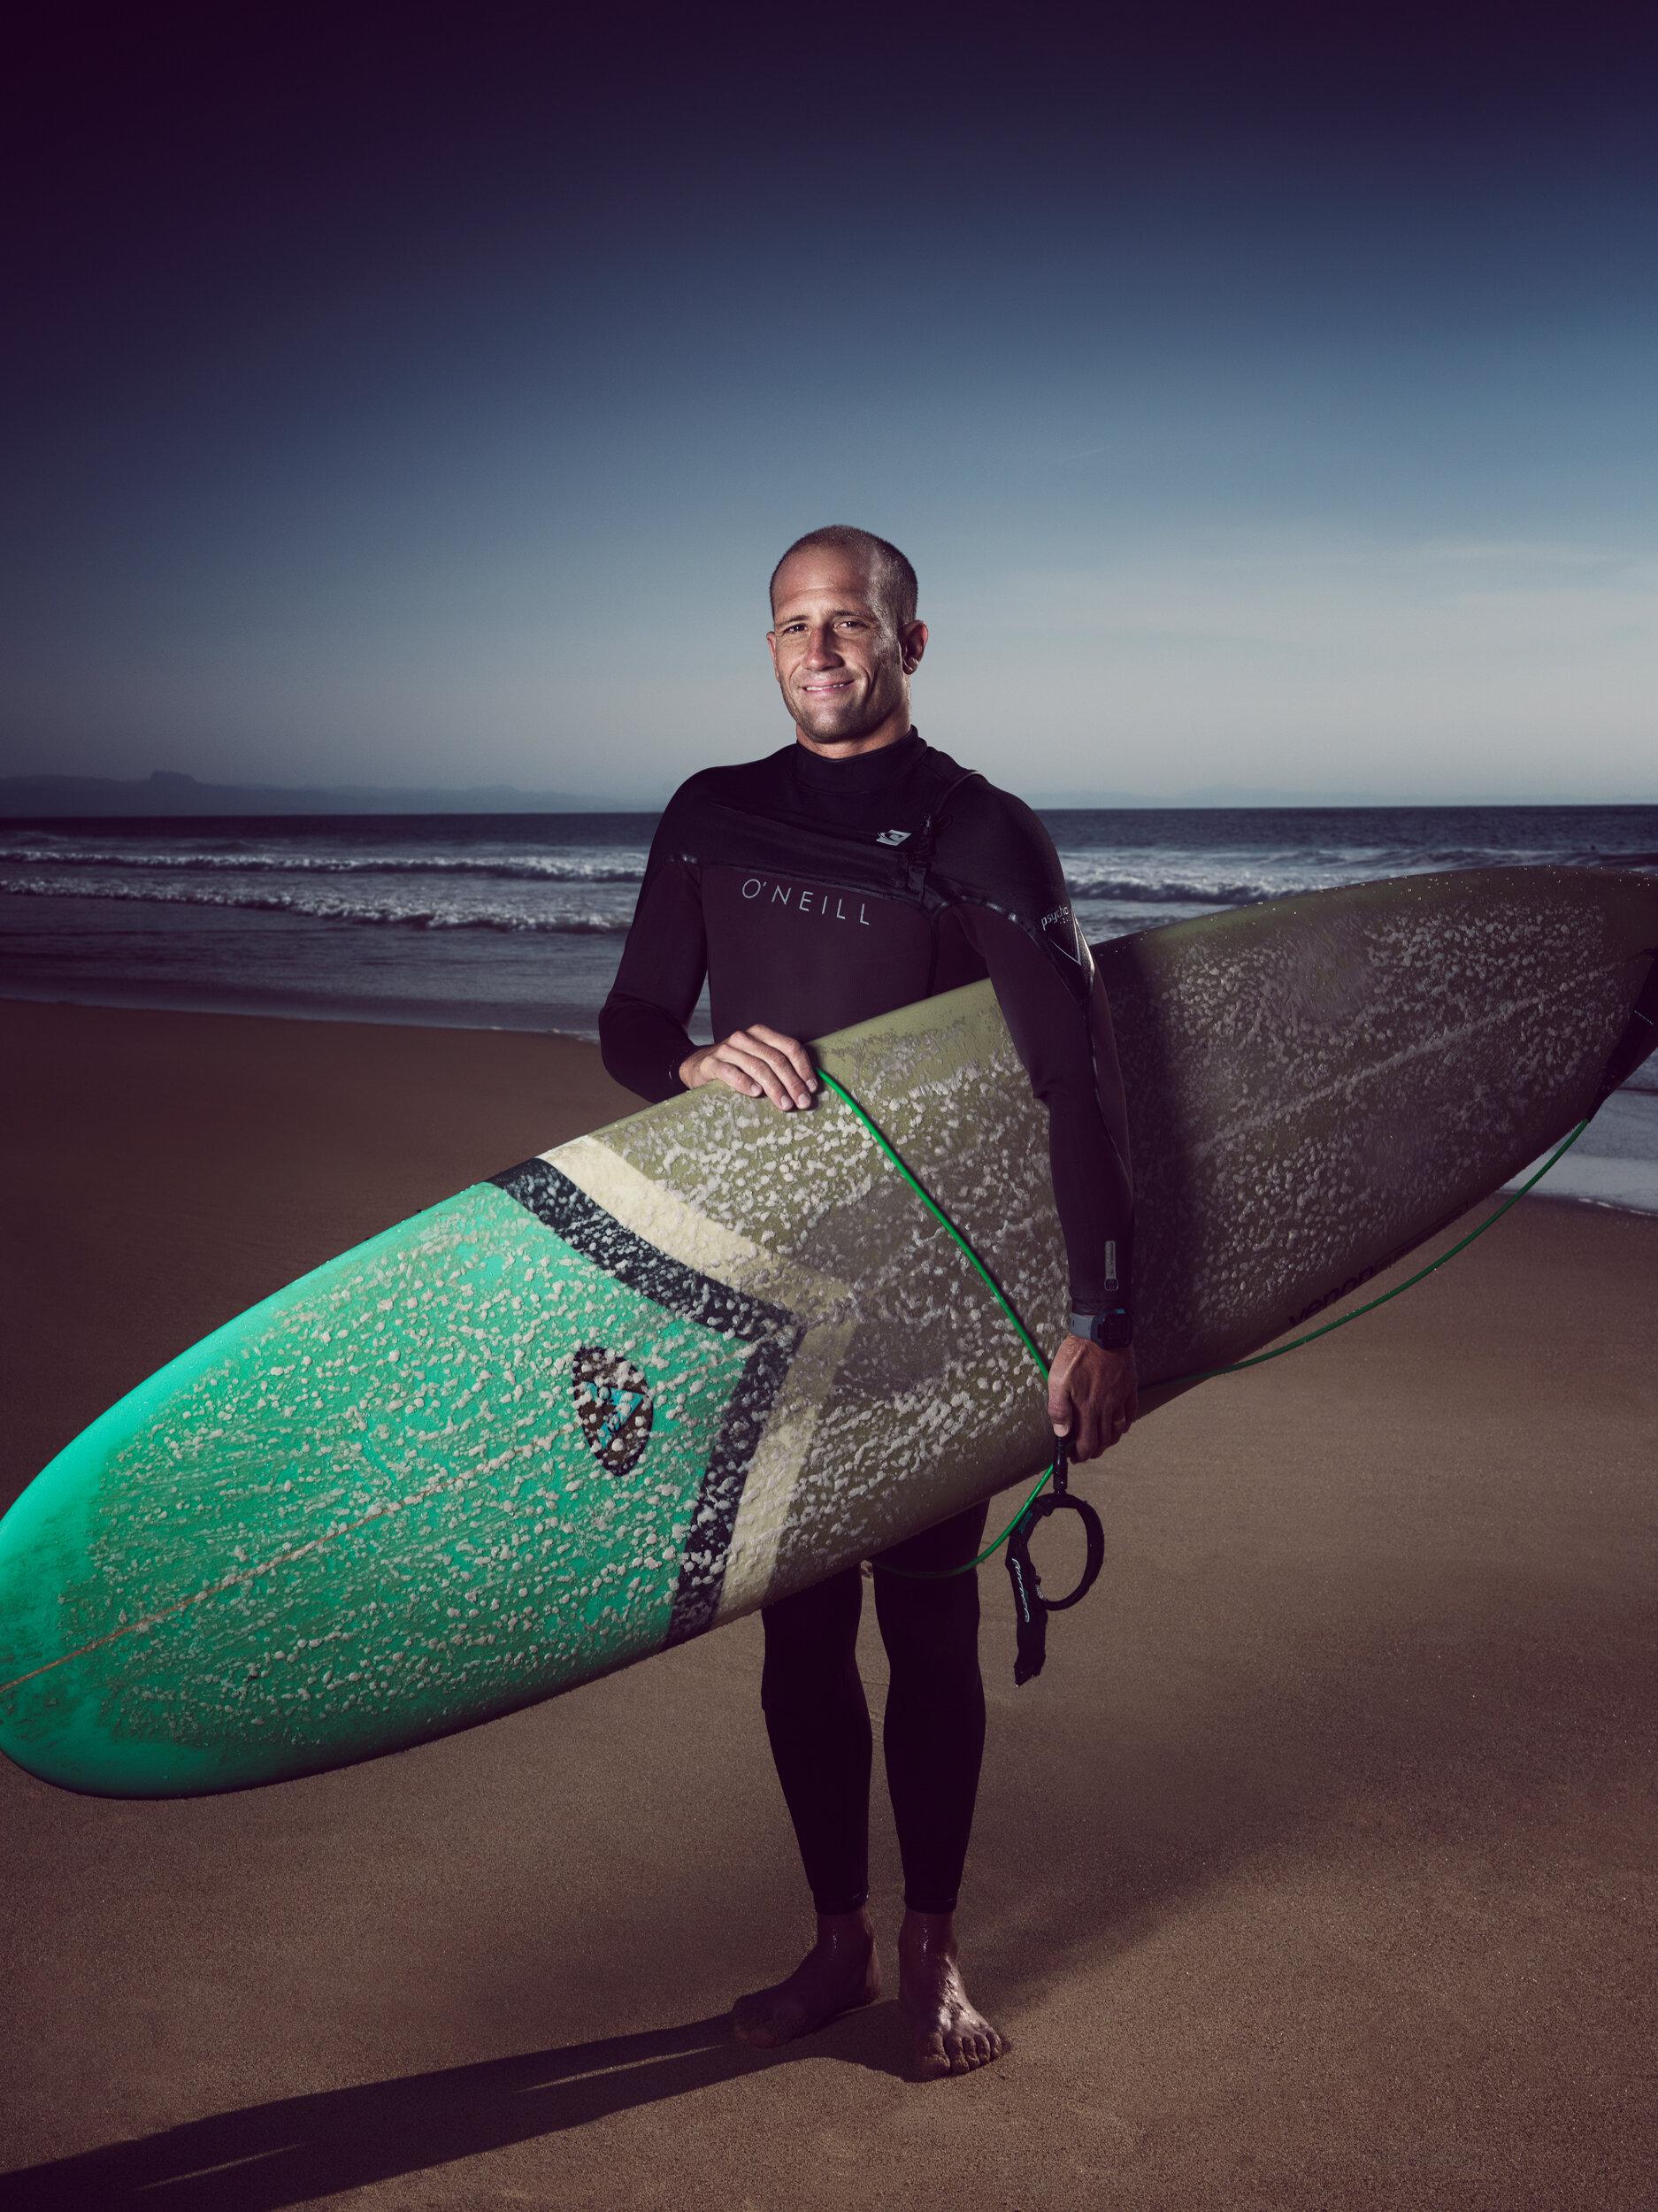 Surf_2.jpg